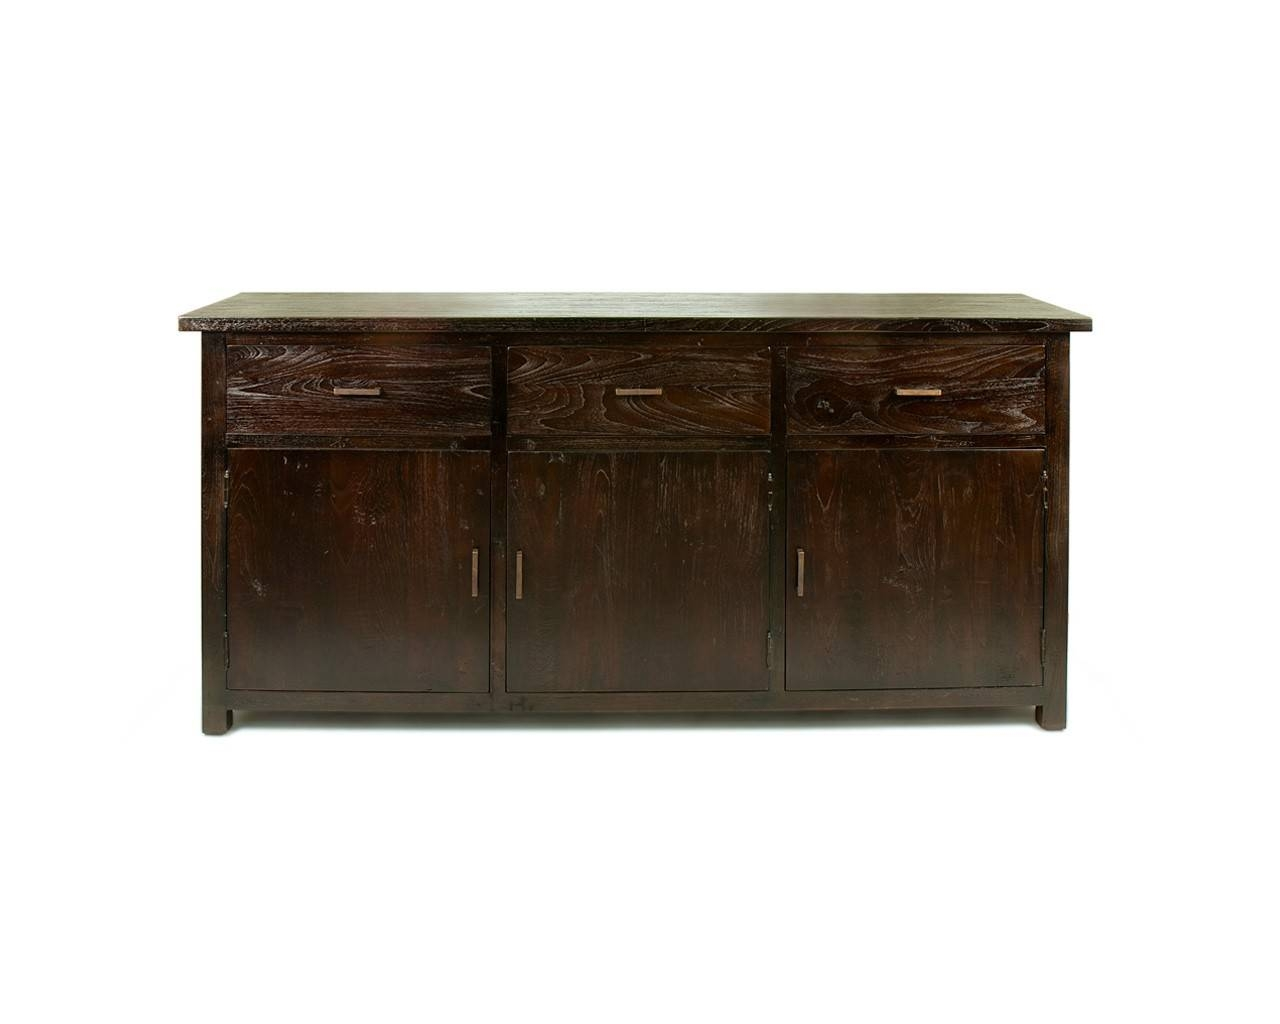 Large Dark Teak Sideboard – Reclaimed Wood Contemporary Furniture Pertaining To Dark Wood Sideboards (View 9 of 15)